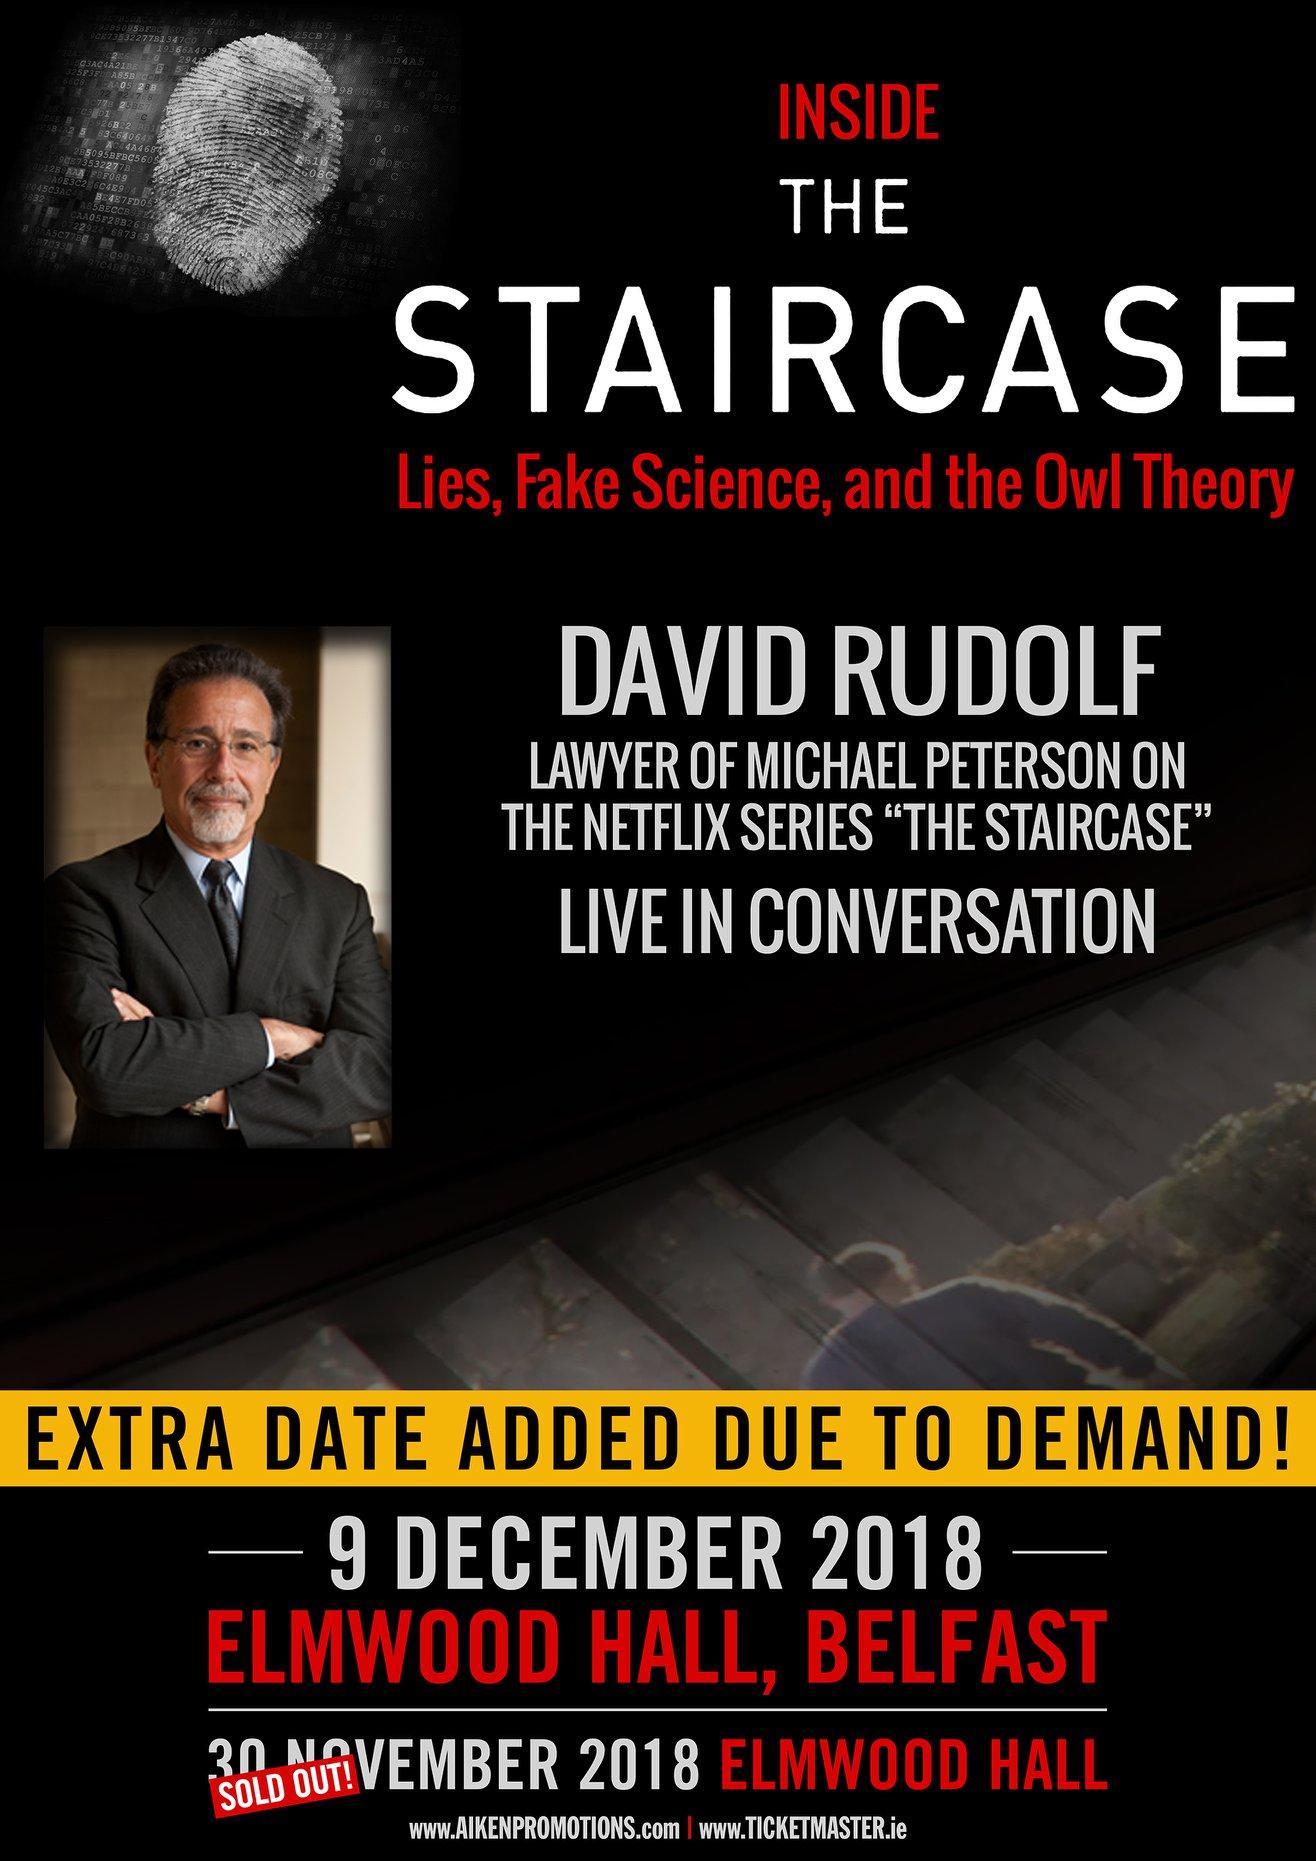 INSIDE STAIRCASE ELMWOOD HALL EXTRA DATE.jpg